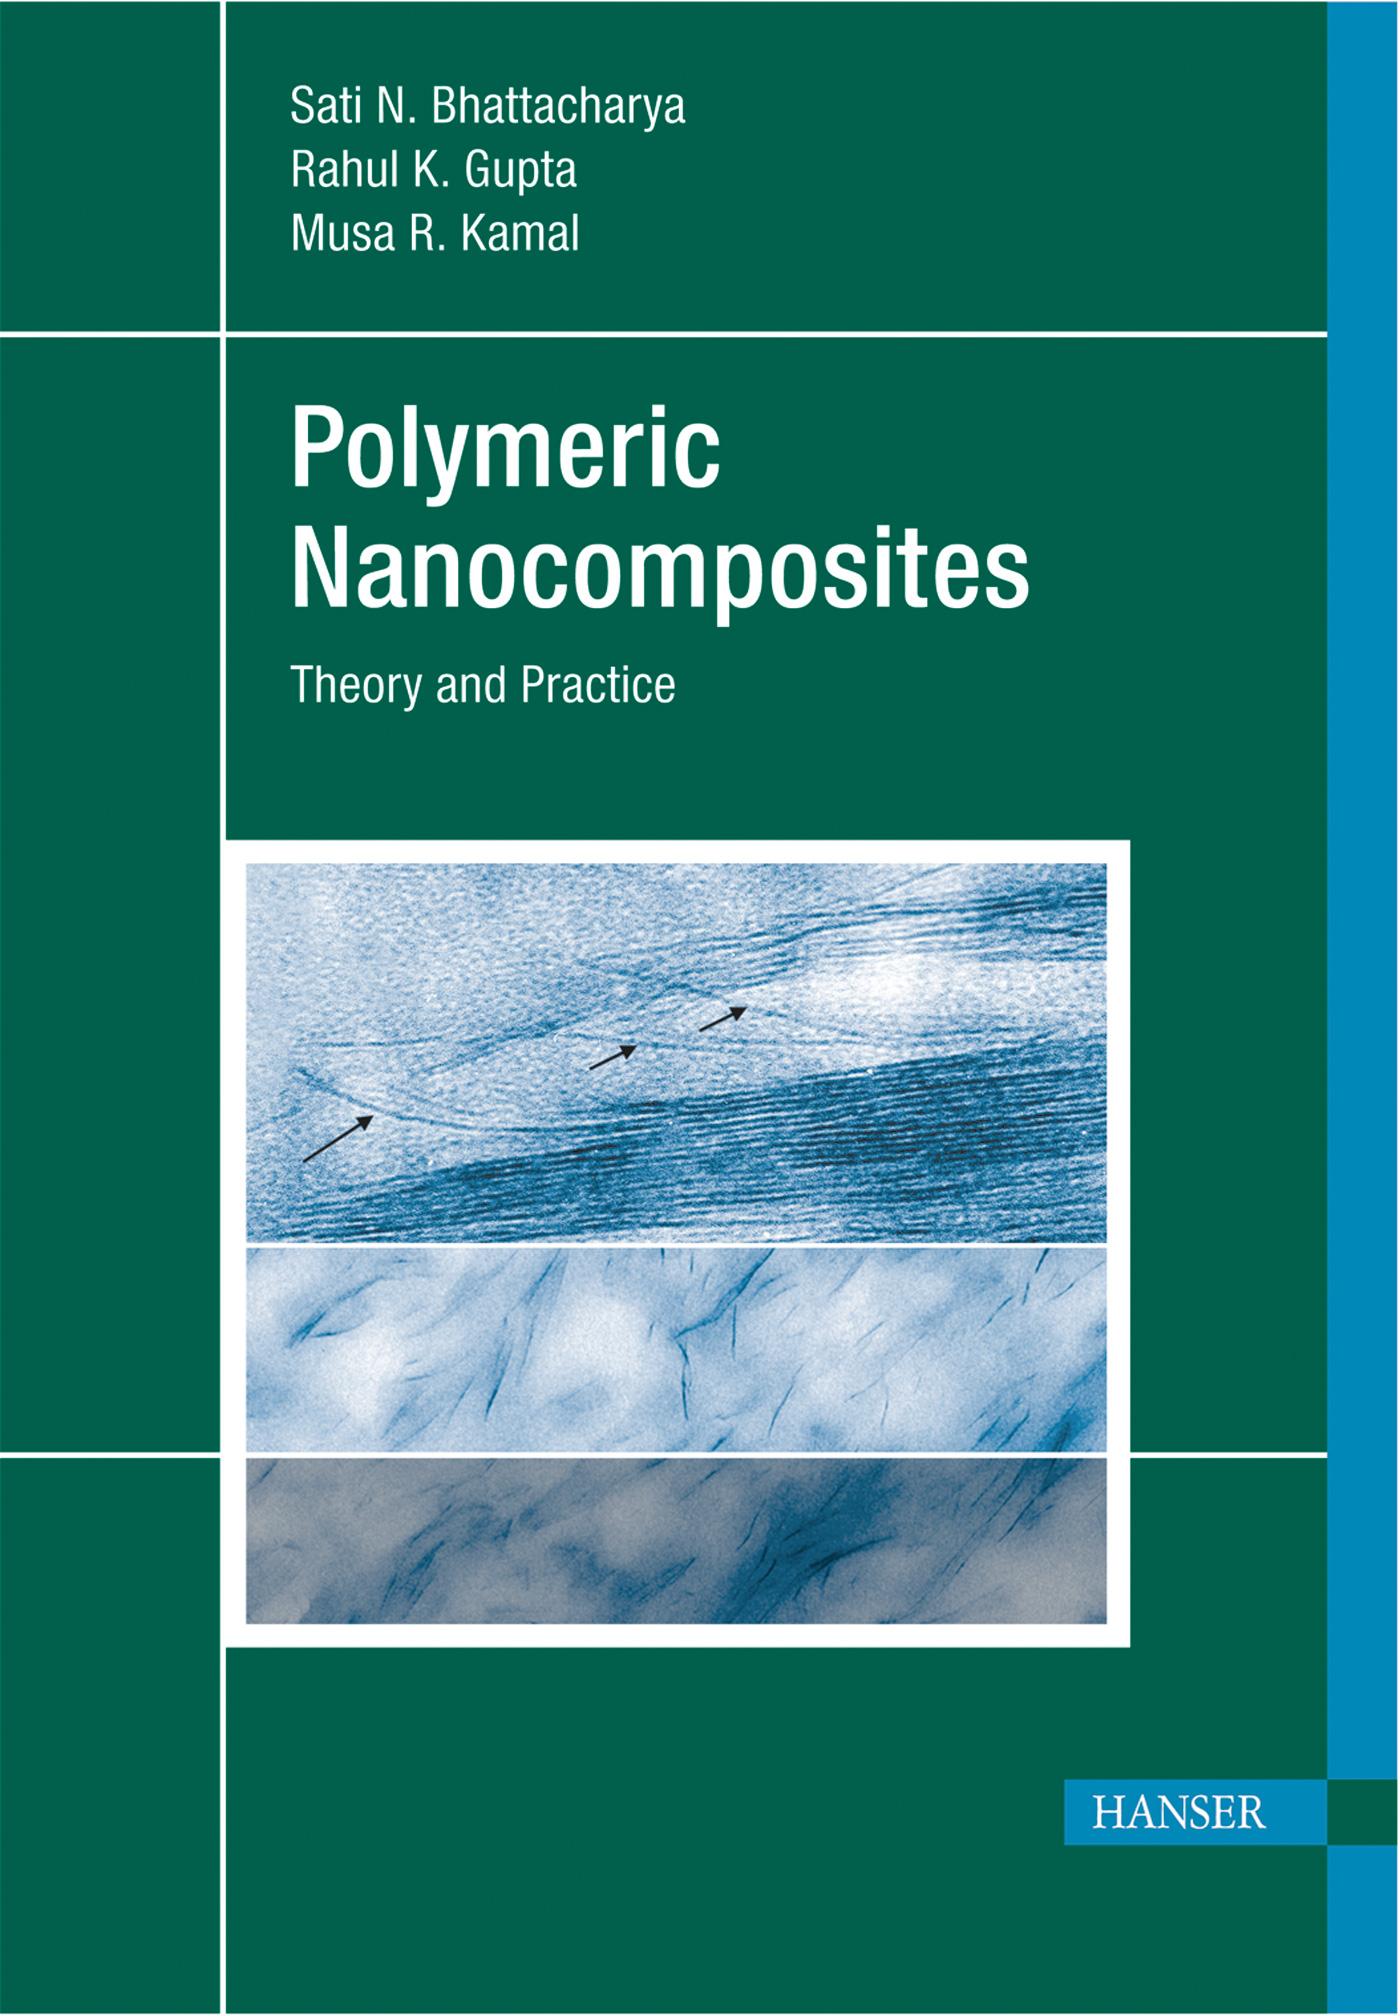 Bhattacharya, Kamal, Gupta, Polymeric Nanocomposites, 978-3-446-40270-6